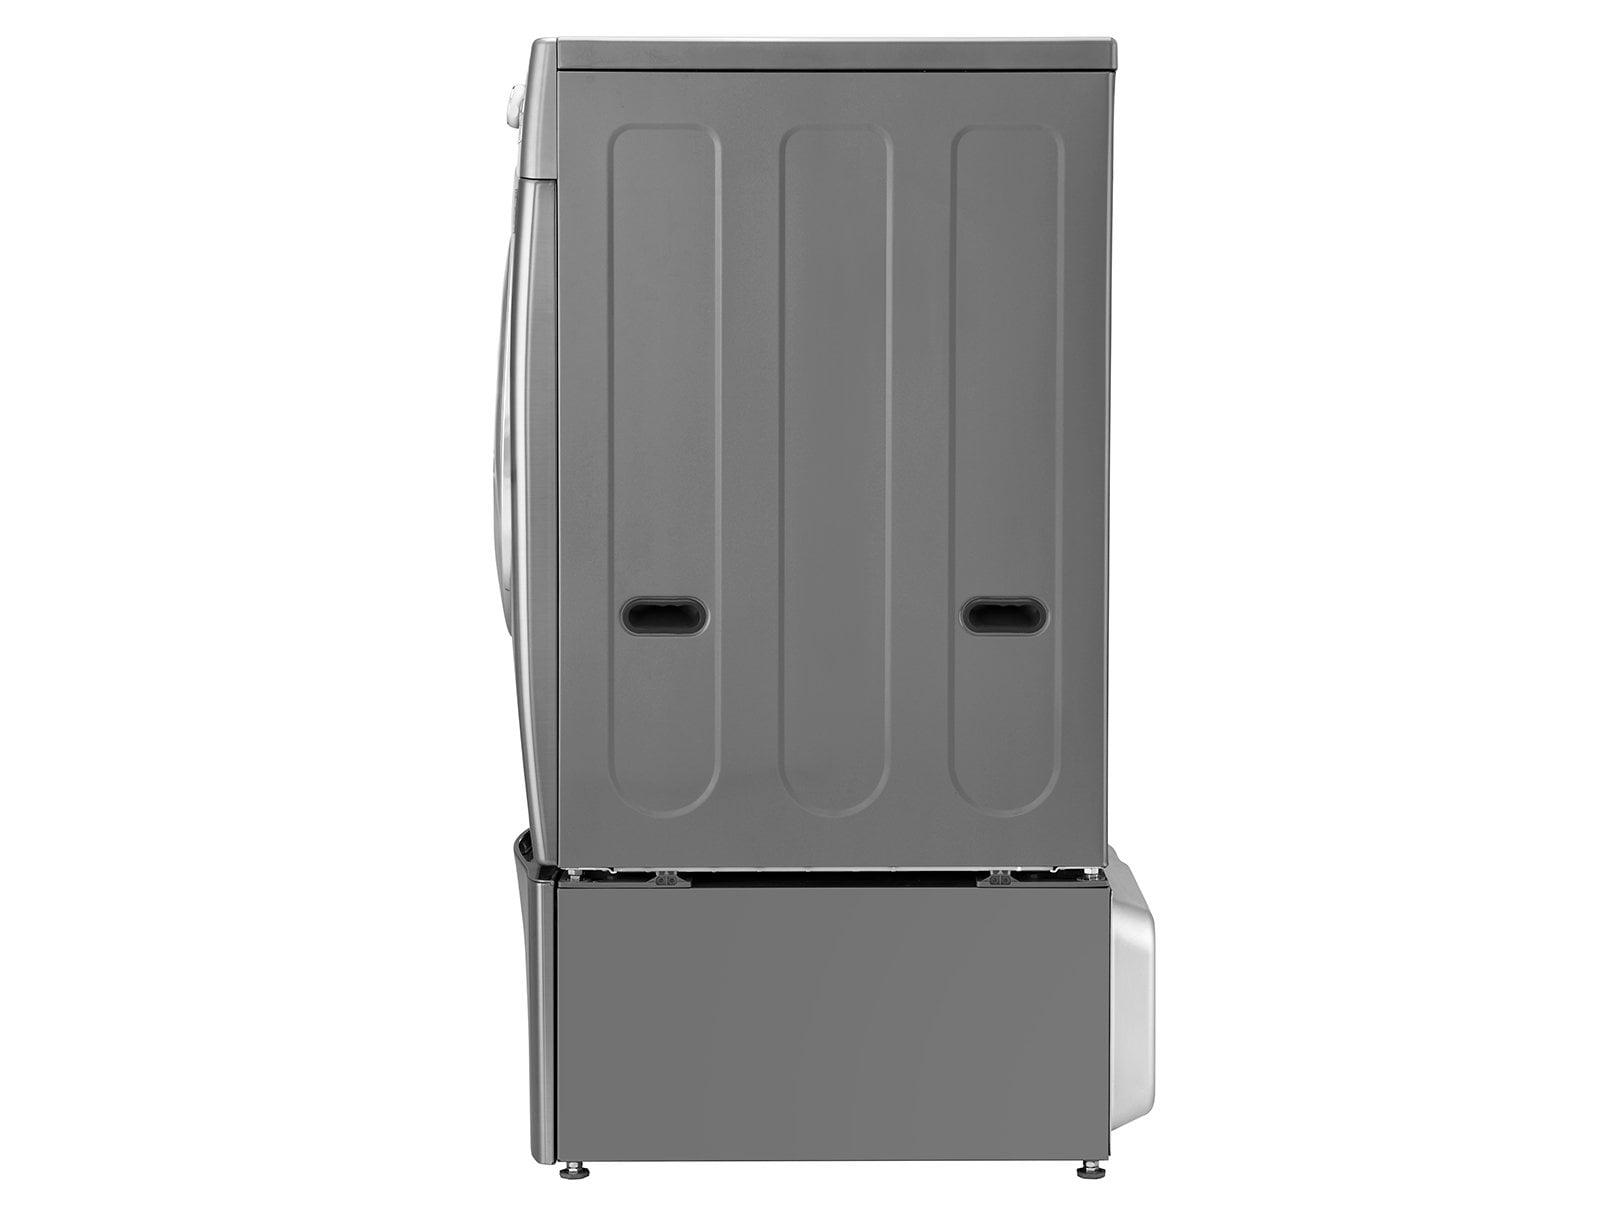 Lavadora Lg Frontal 20Kg Compatible con Twinwash de 3.5Kg Wm20Vvs